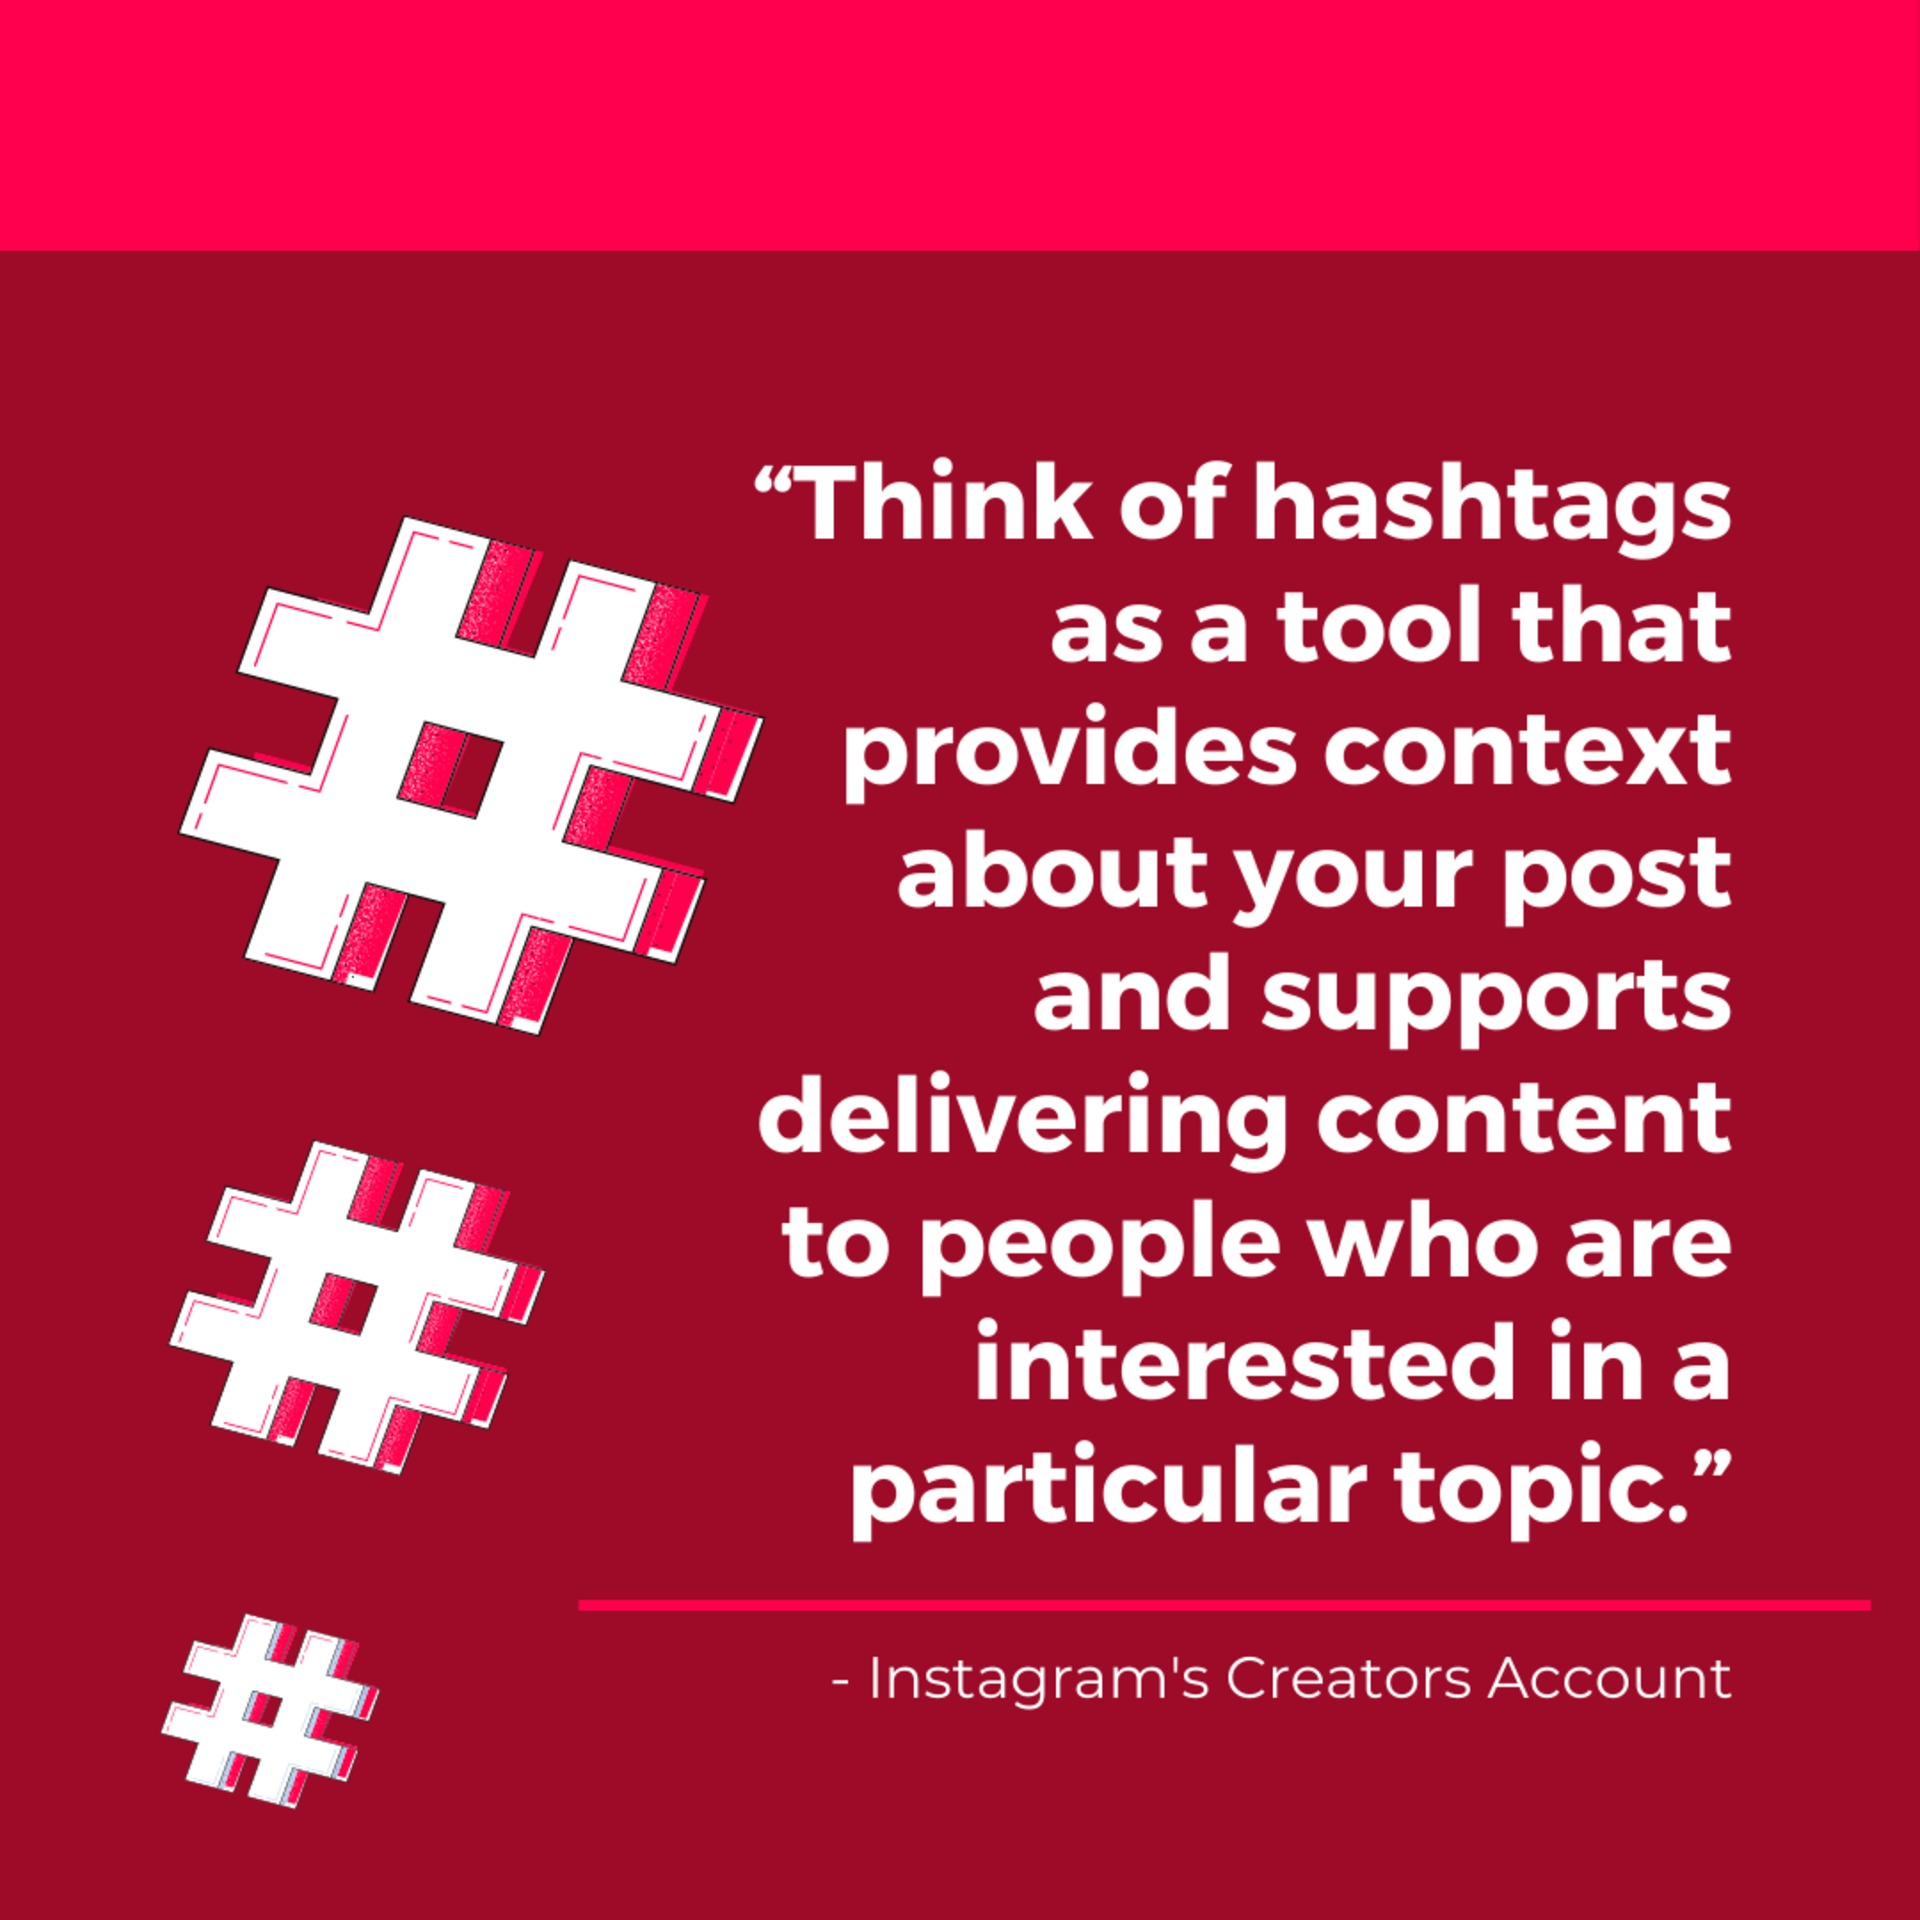 Winkl on Influencer Marketing - Instagram hashtags creatives2